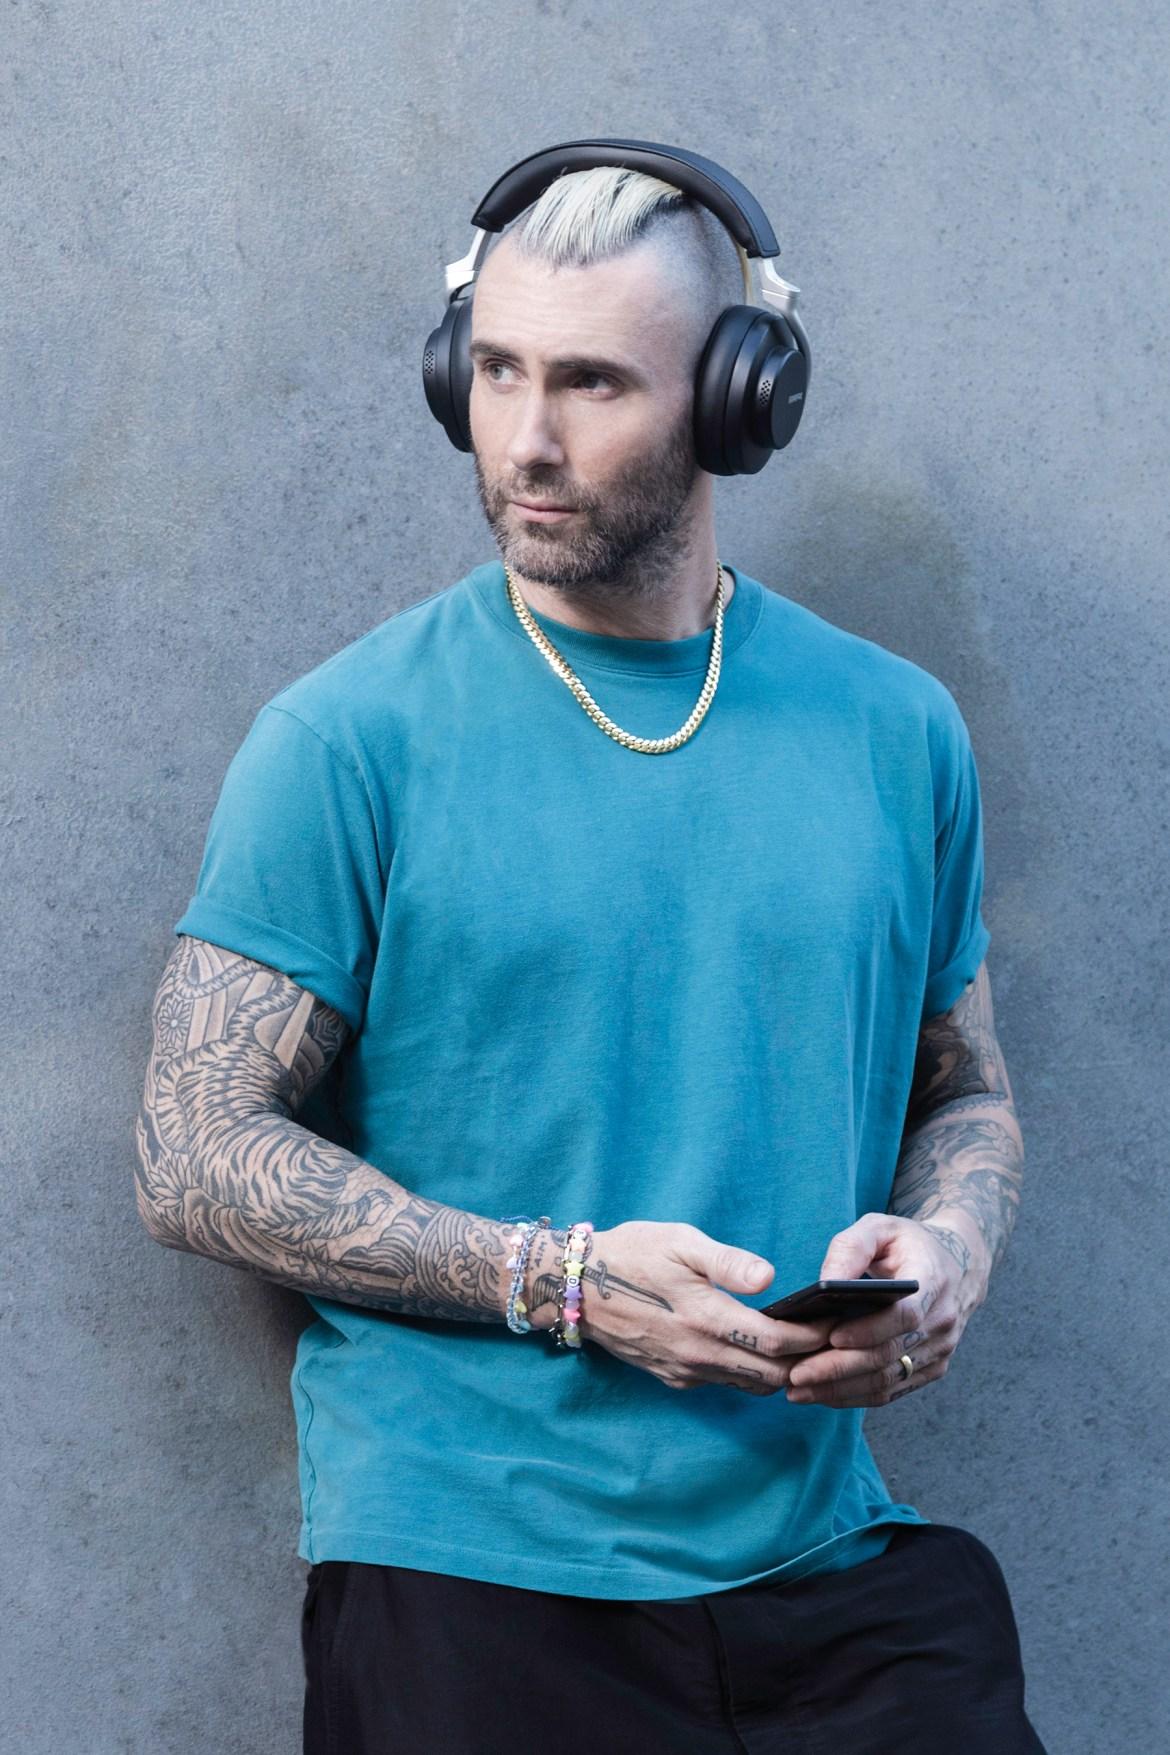 https://www.multivu.com/players/English/8711551-shure-aonic-headphones-earphones-adam-levine/image/AdamLevineAONIC50_1585776151016-HR.jpg